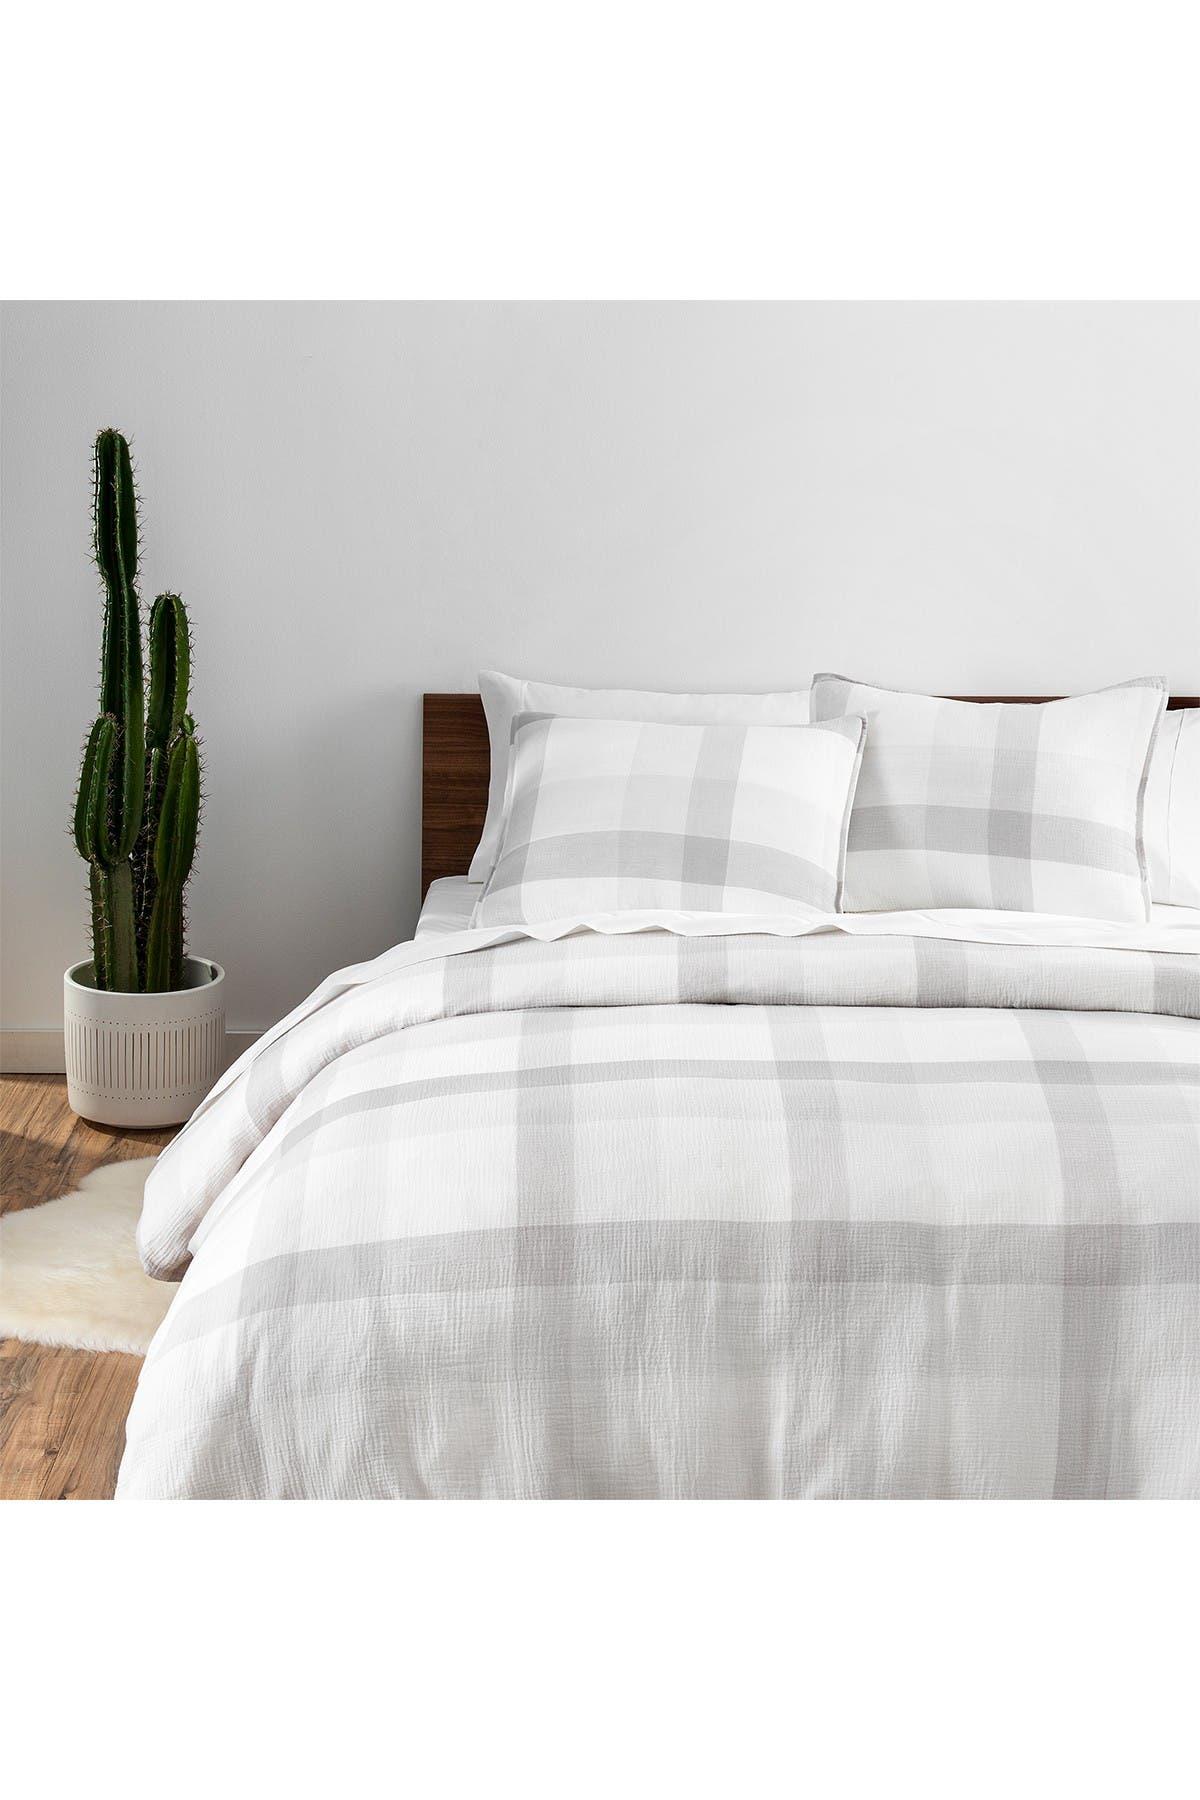 Image of UGG Toria Comforter Set - King - Snow/Seal